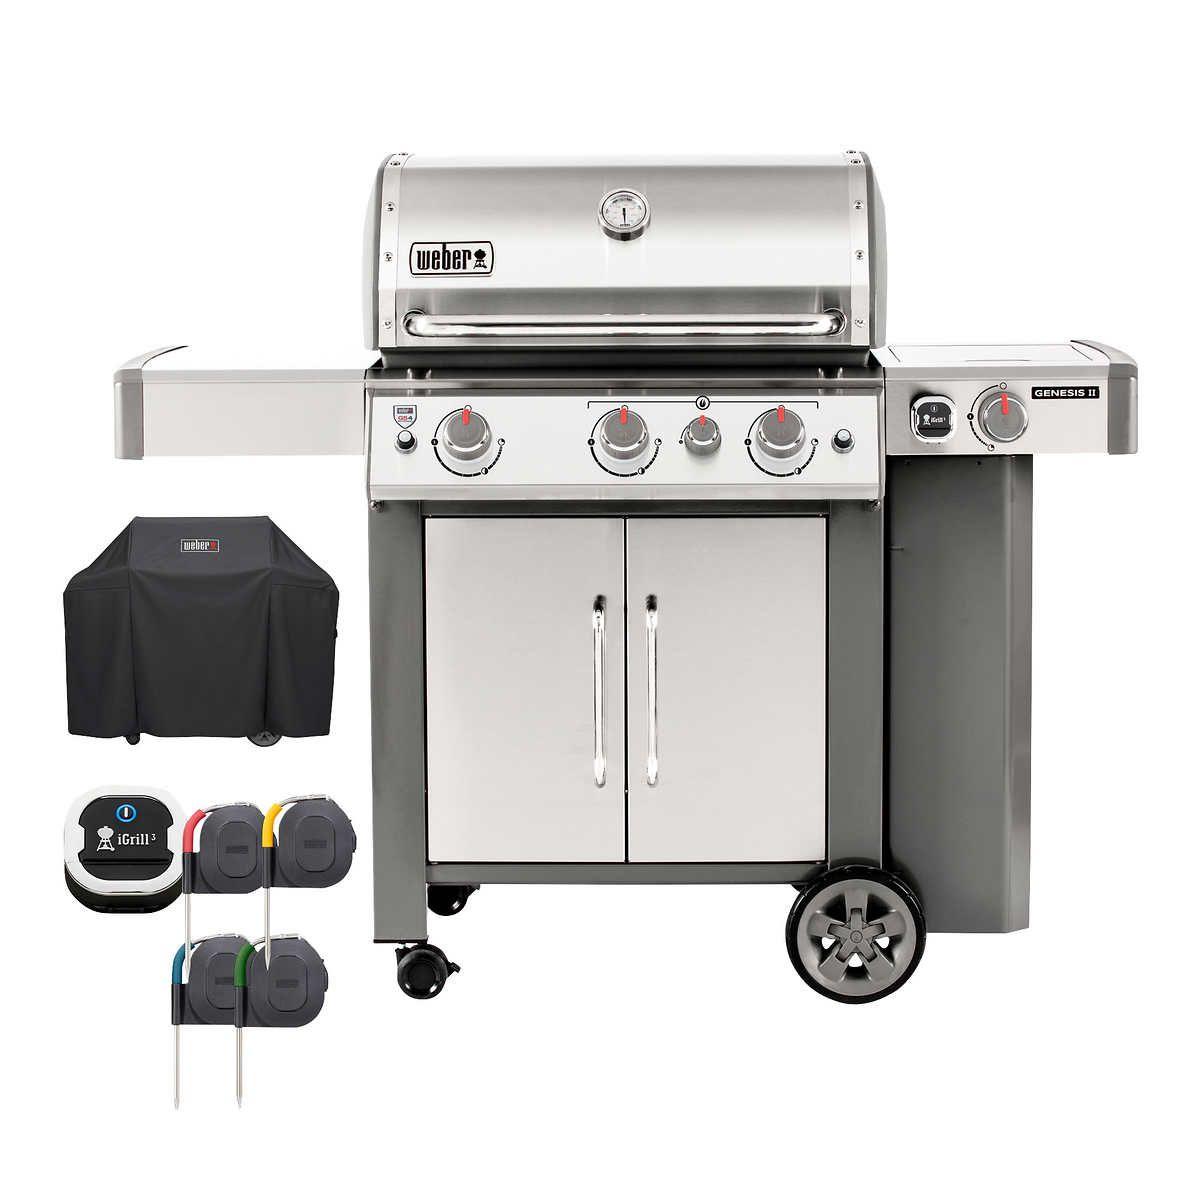 Weber Genesis Ii S 345 3 Burner Gas Grill In 2020 Gas Grill 3 Burner Gas Grill Stainless Steel Rod